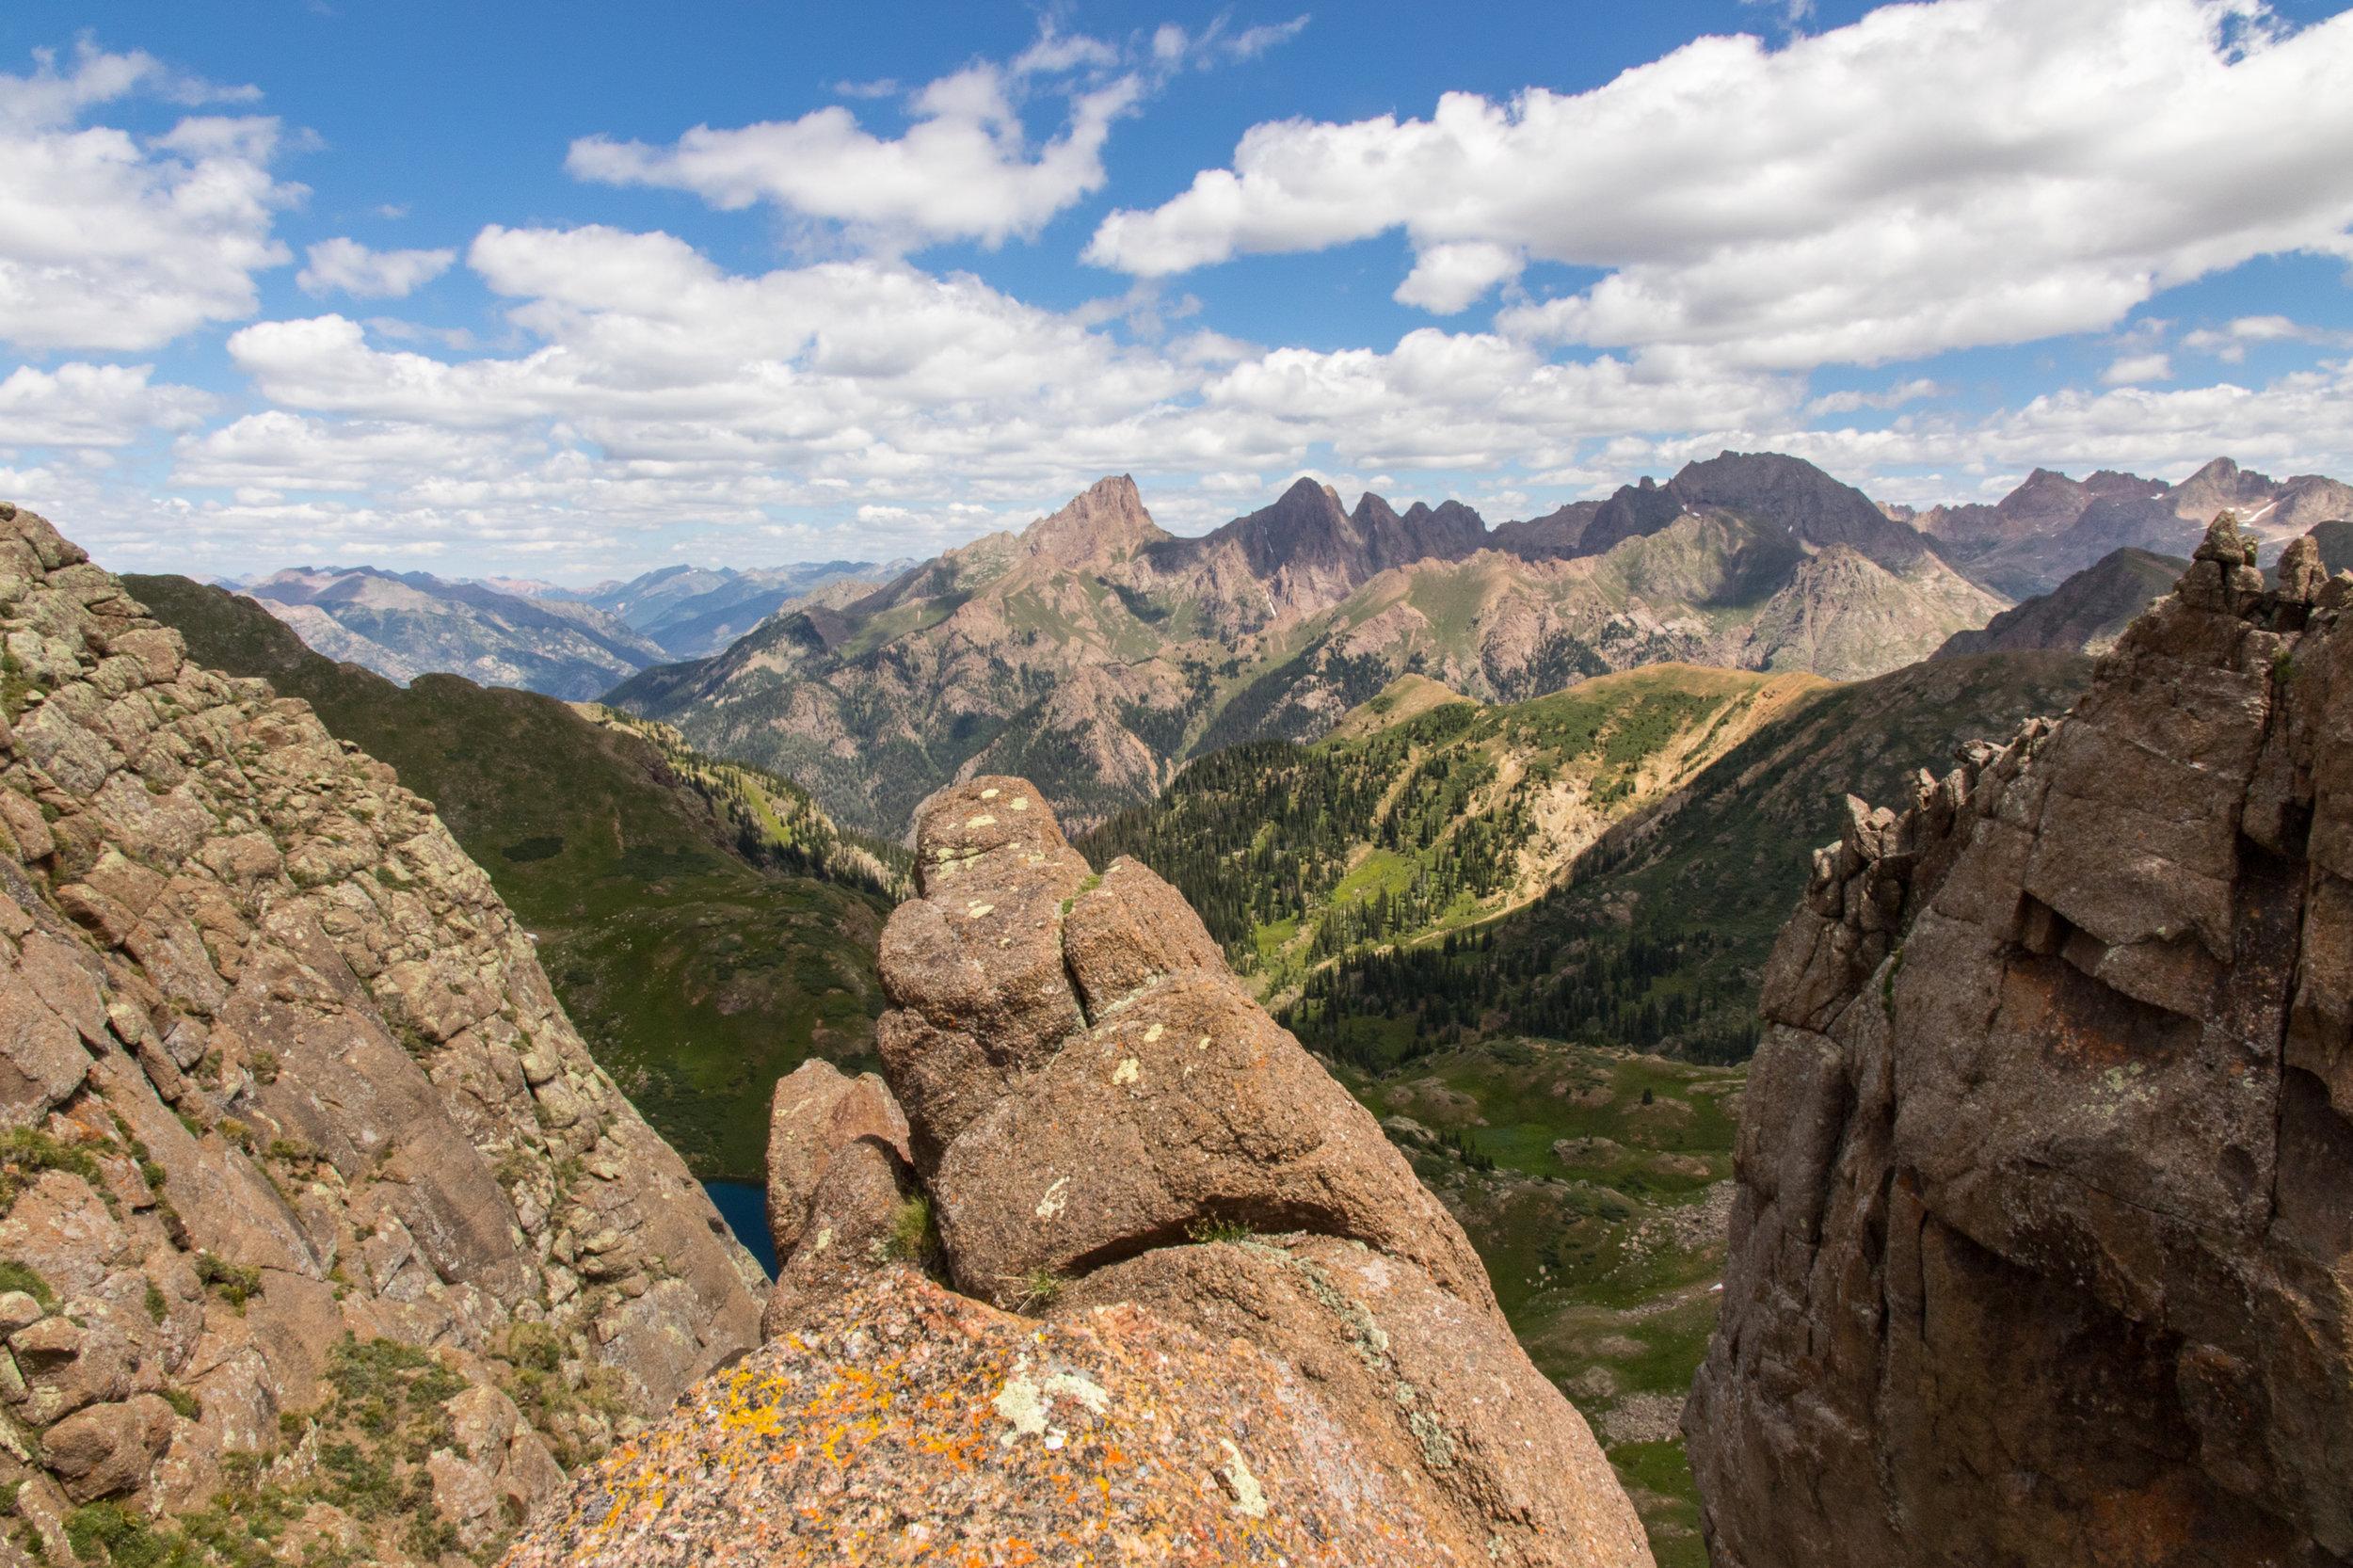 Narrow ridge overlook